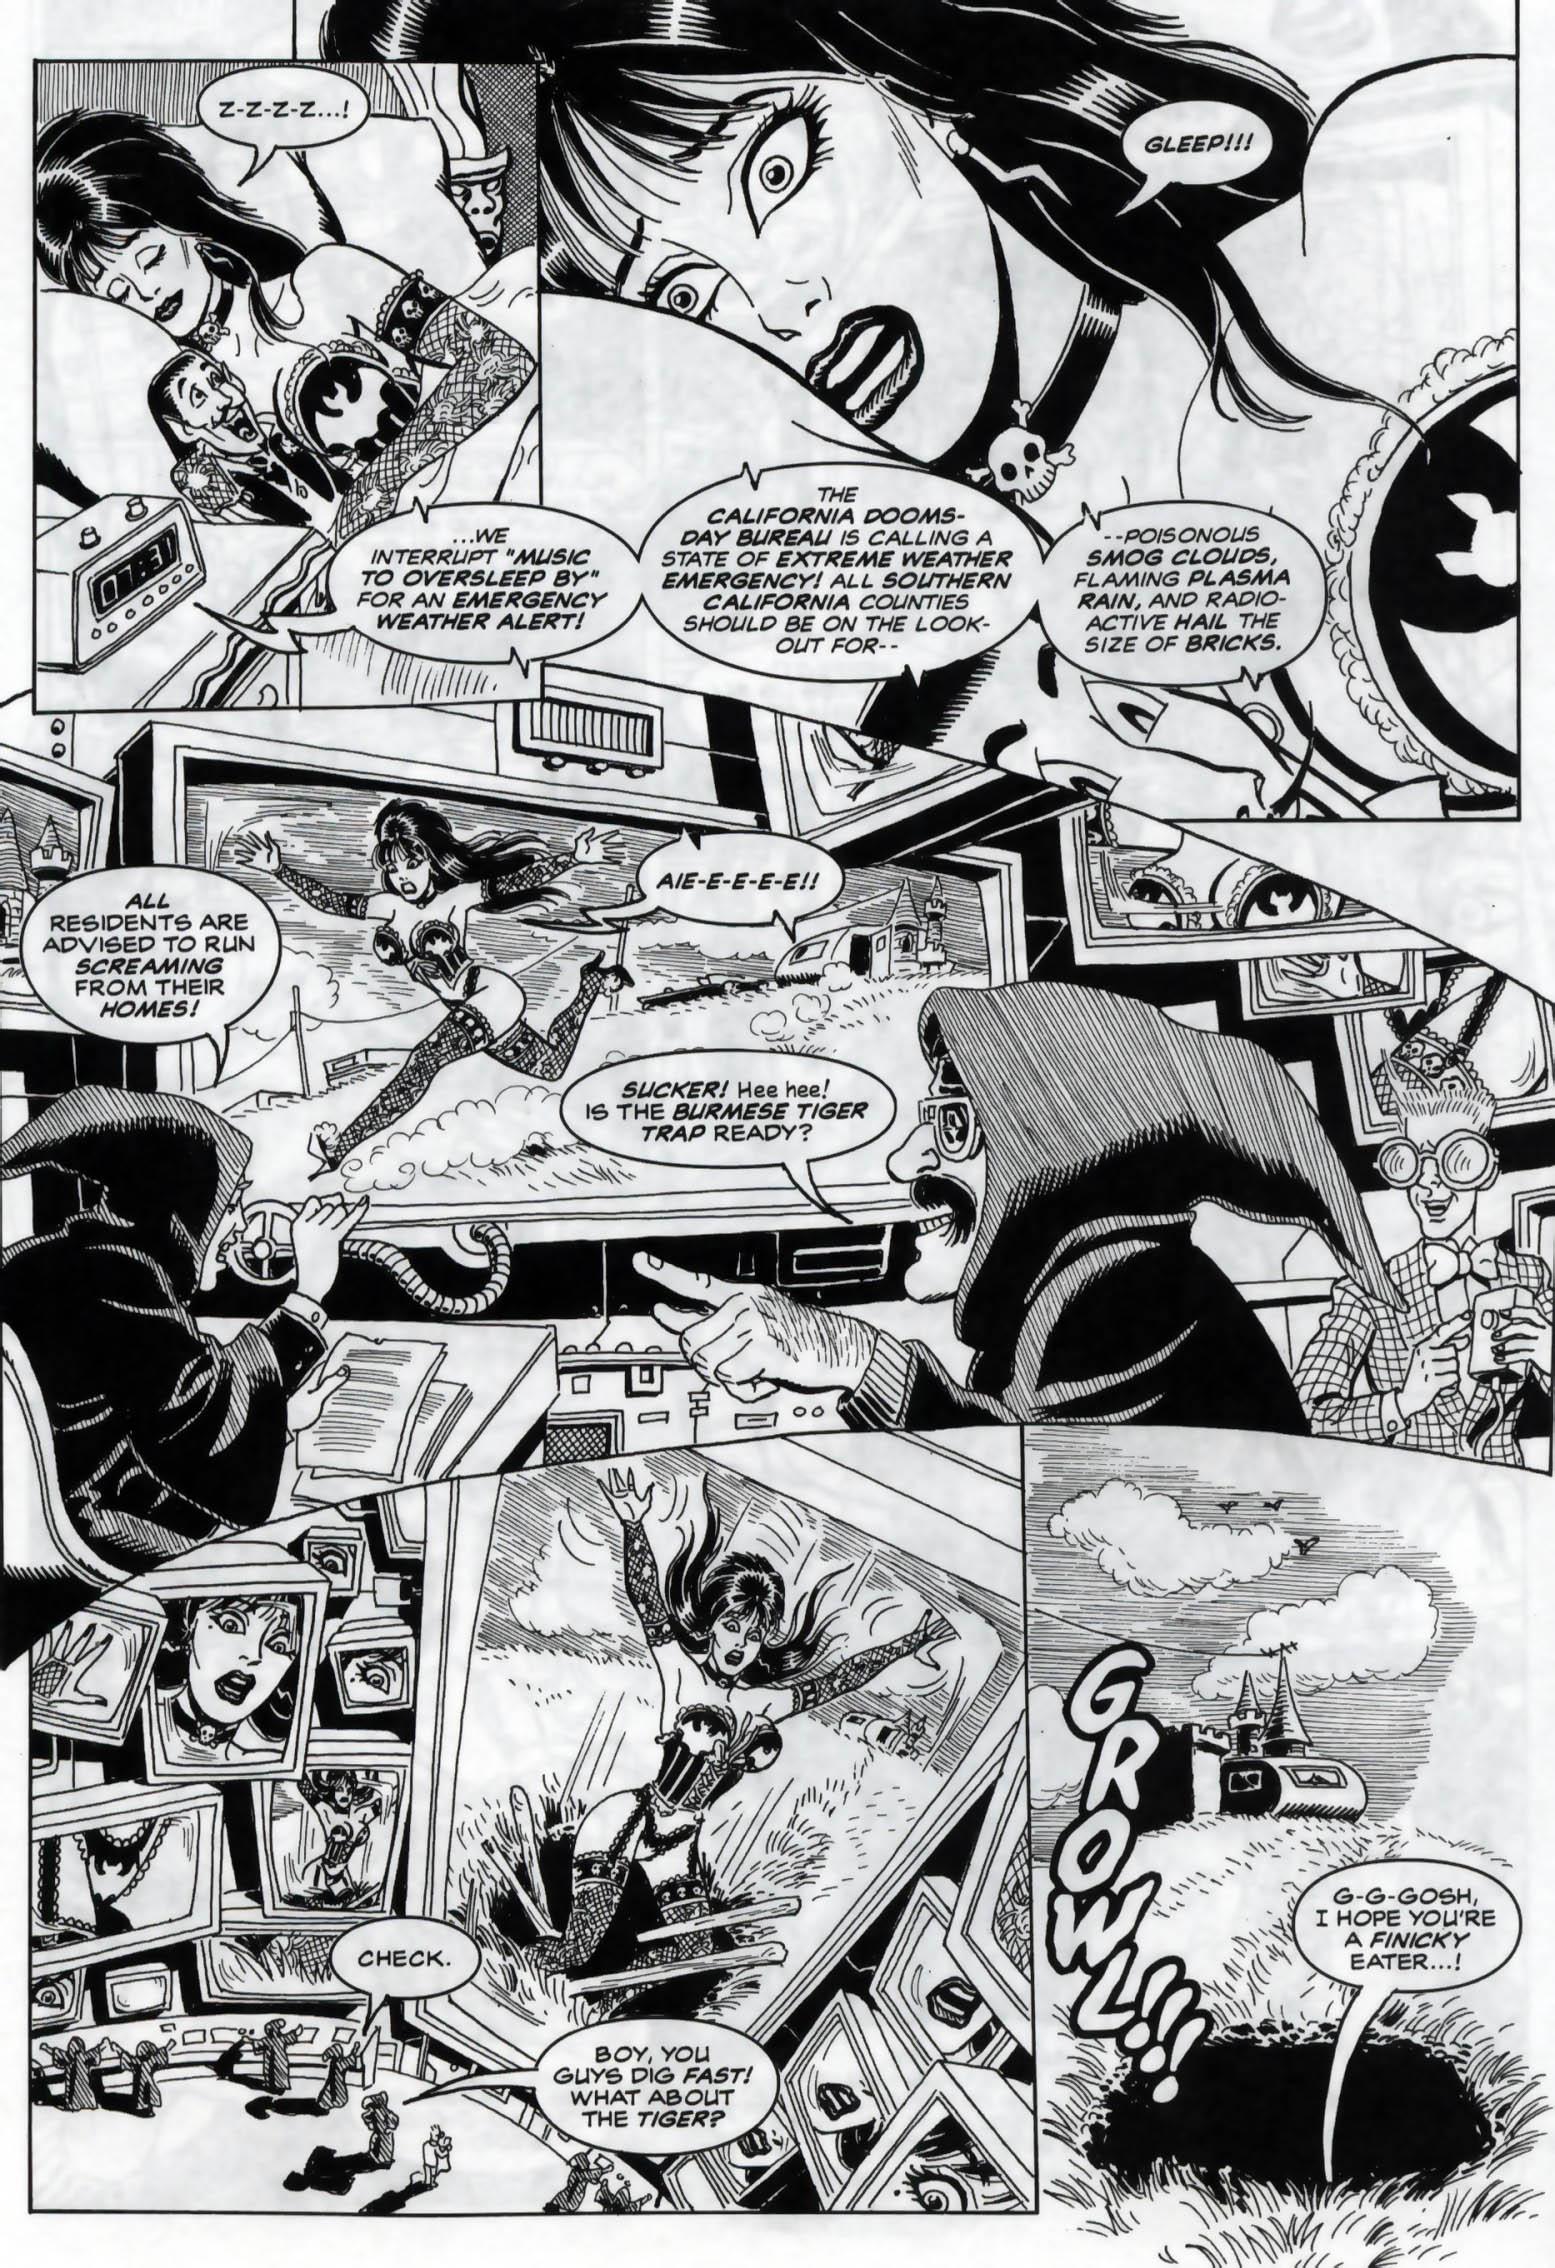 Read online Elvira, Mistress of the Dark comic -  Issue #120 - 6